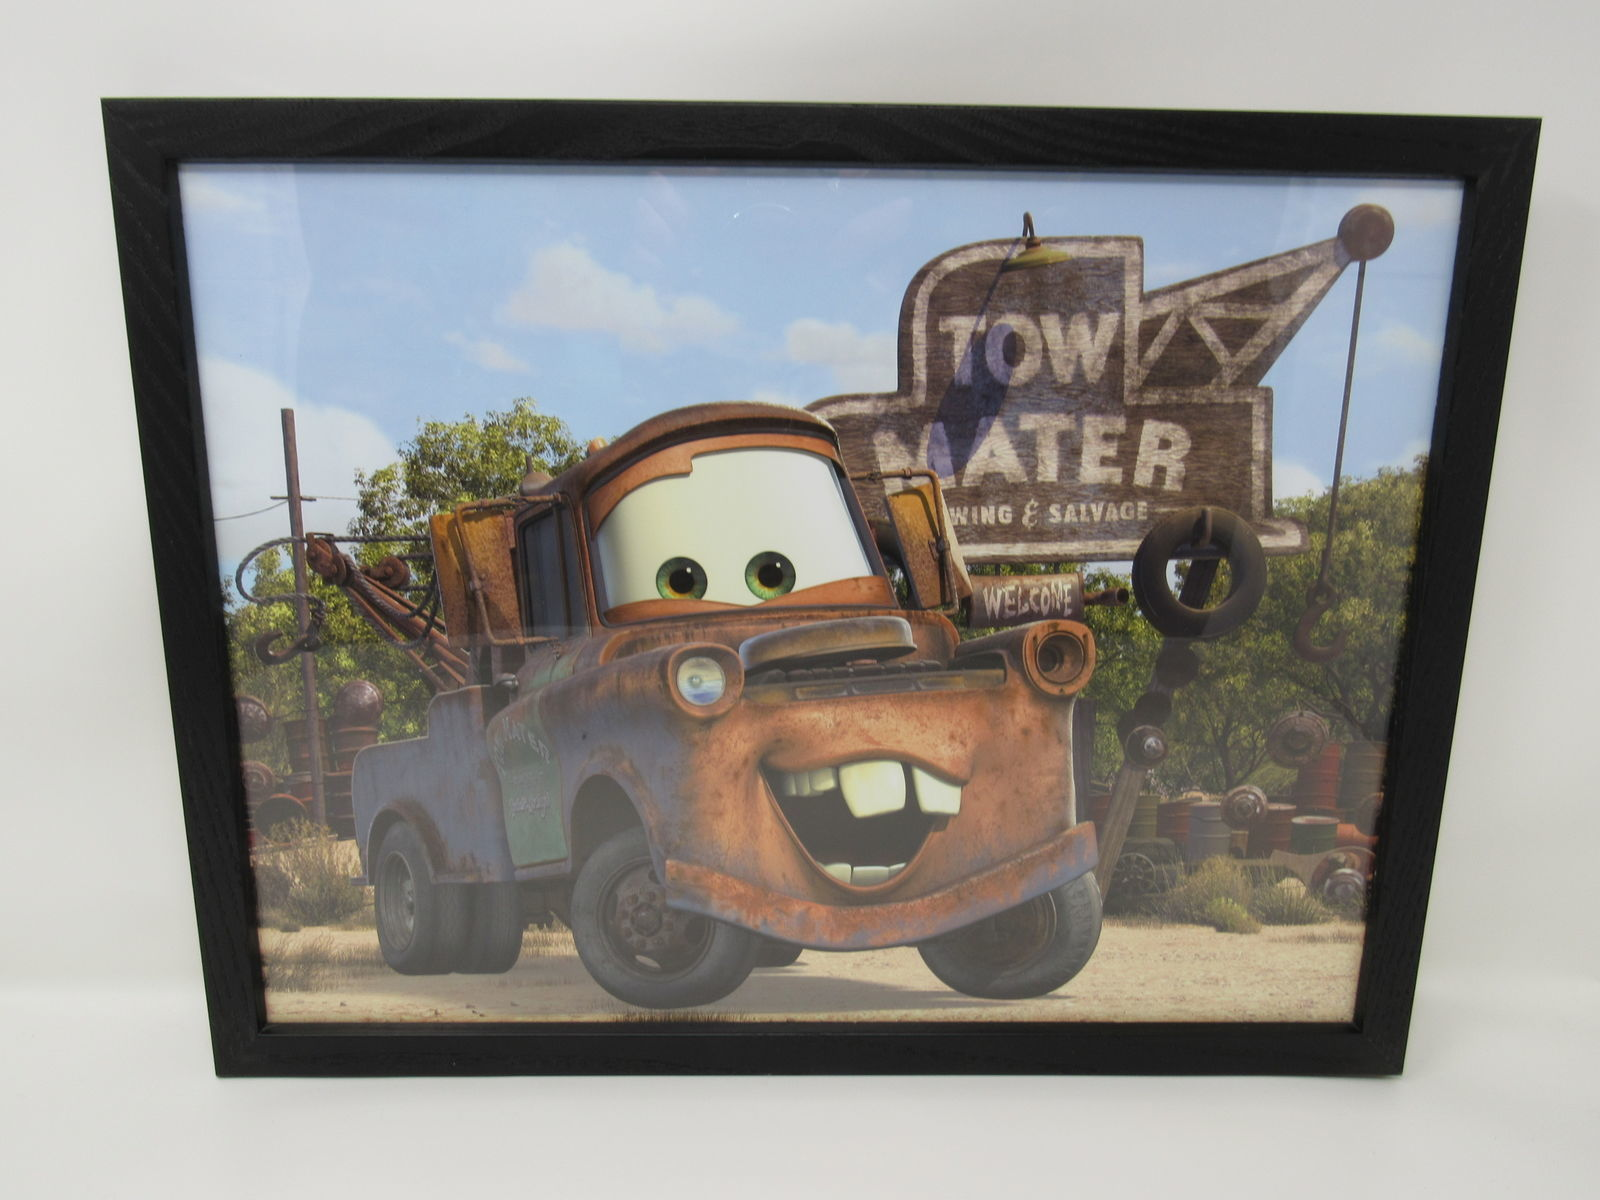 Classic Framed Poster Mater Cars Truck 17in L x 13in W x 1in H